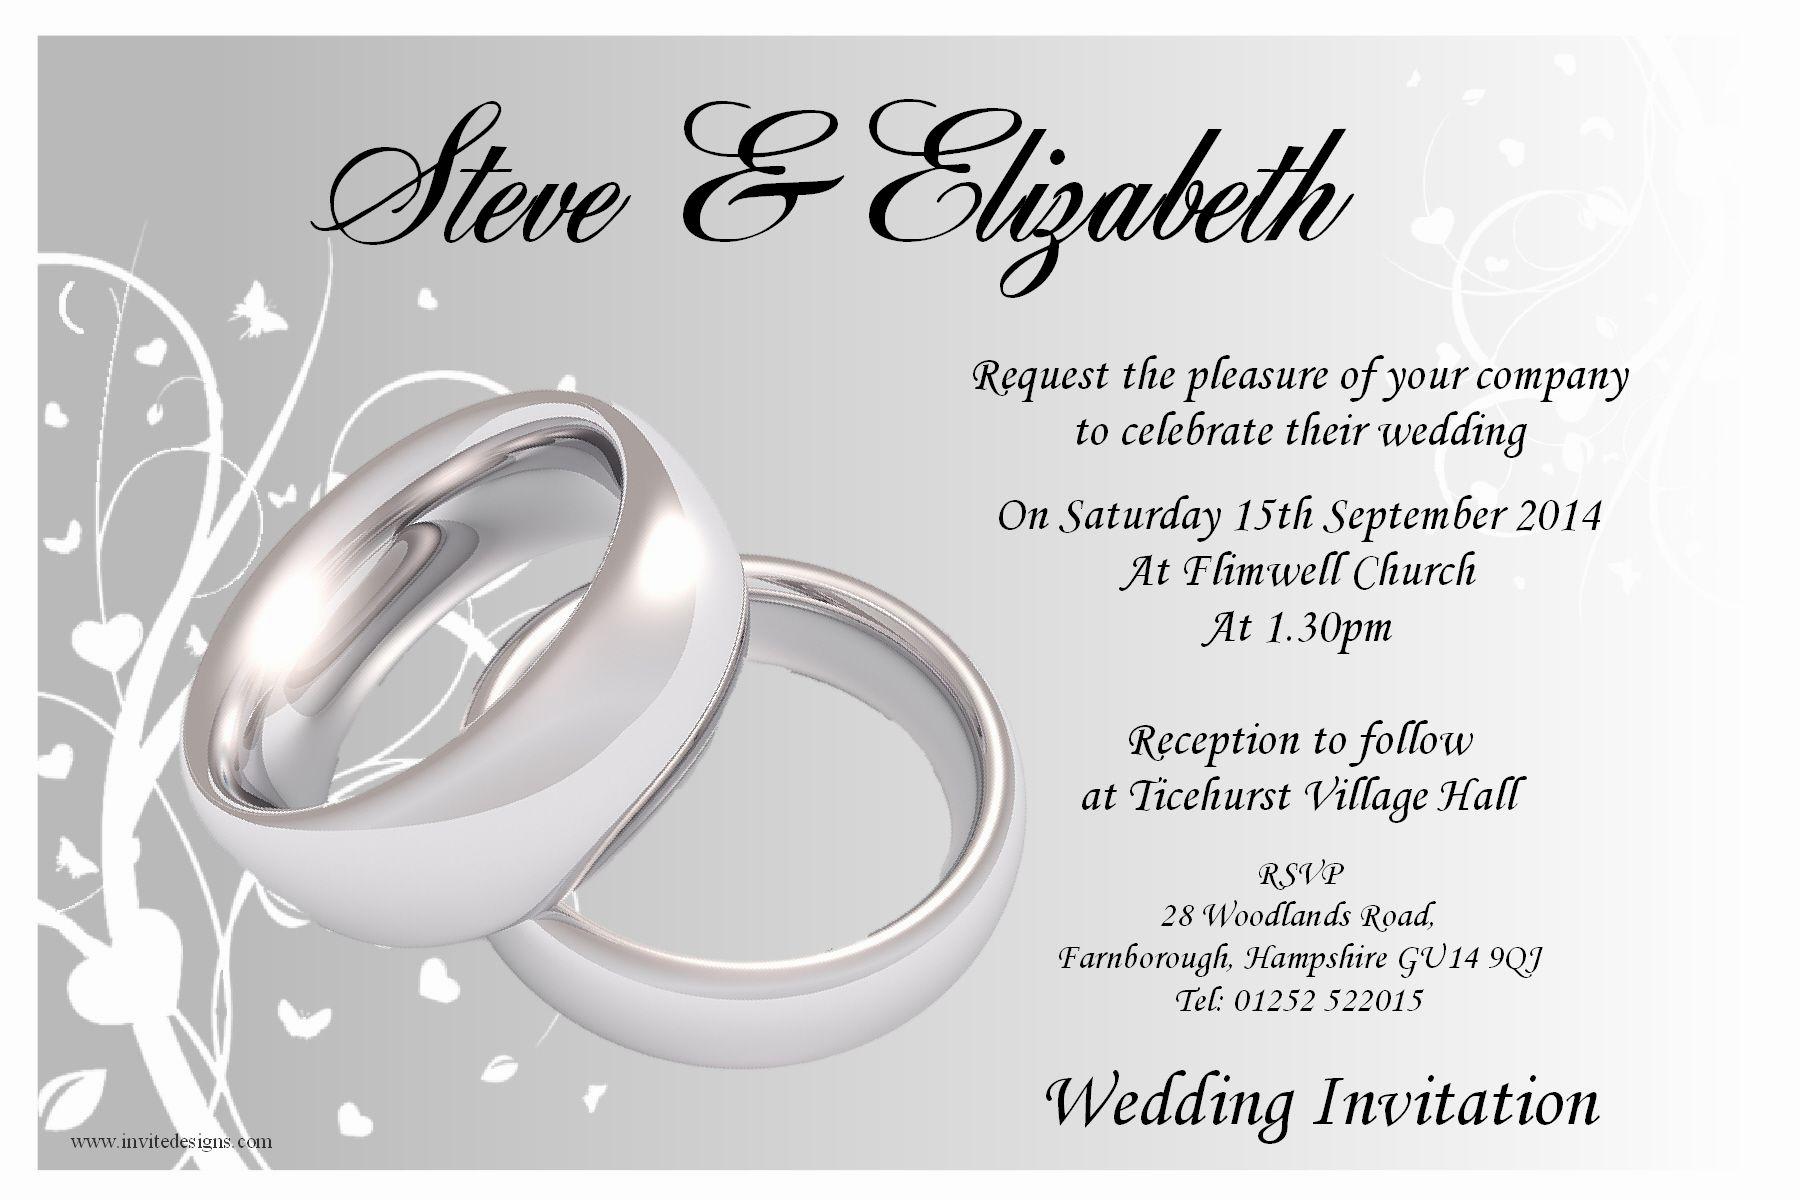 Free Printable Blank Invitation Templates   Vastuuonminun Engagement - Free Printable Engagement Invitations